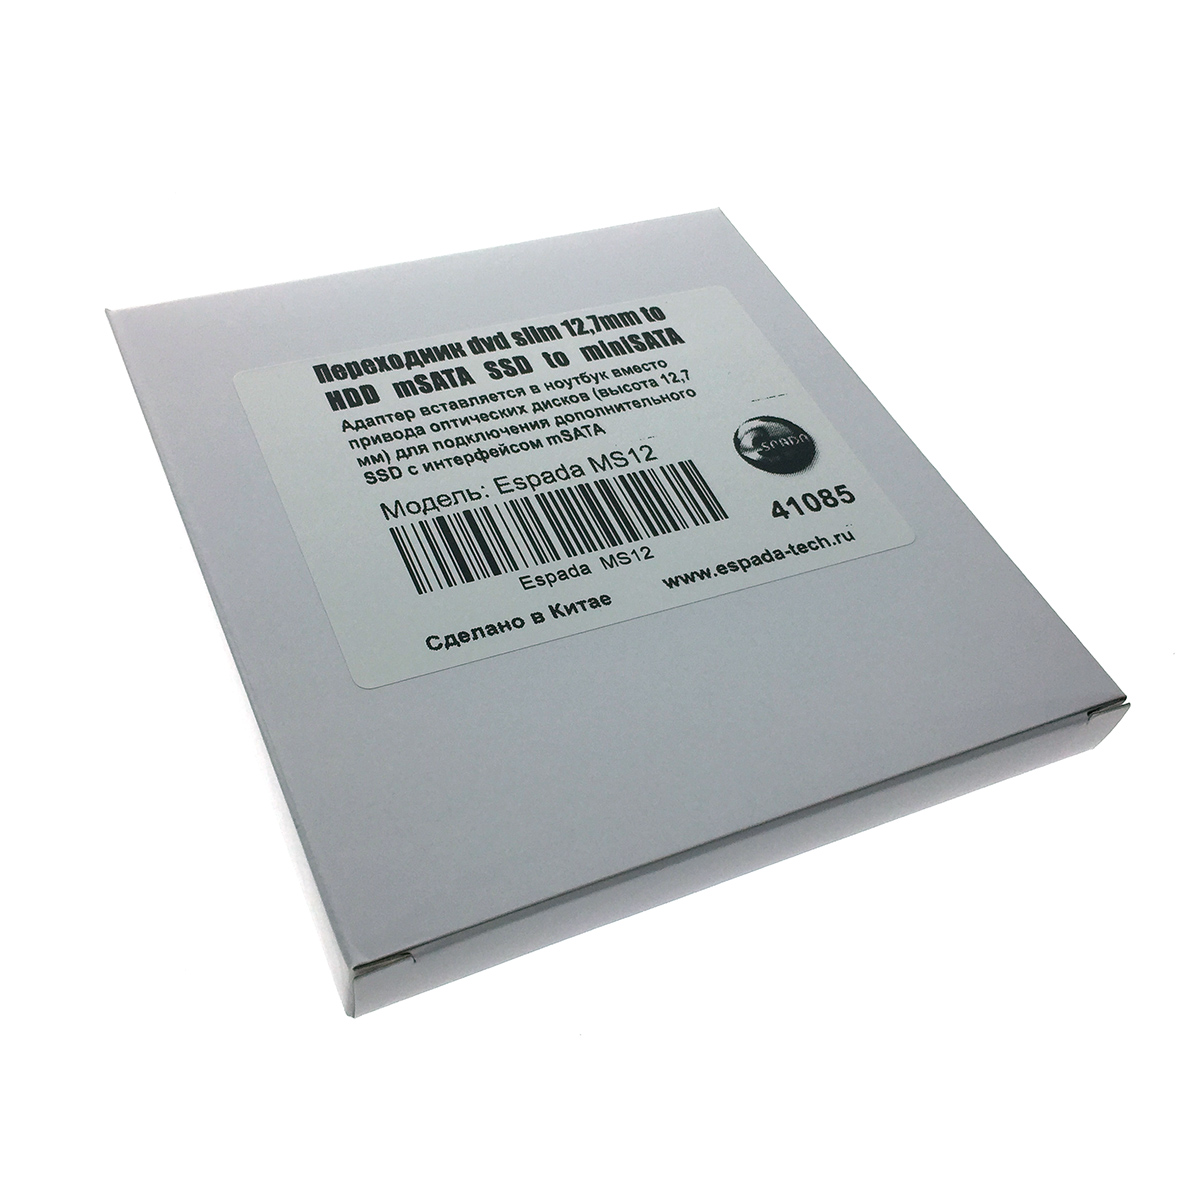 Адаптер оптибей Espada MS12 mSATA SSD to miniSATA 12,7мм для подключения SSD к ноутбуку вместо DVD